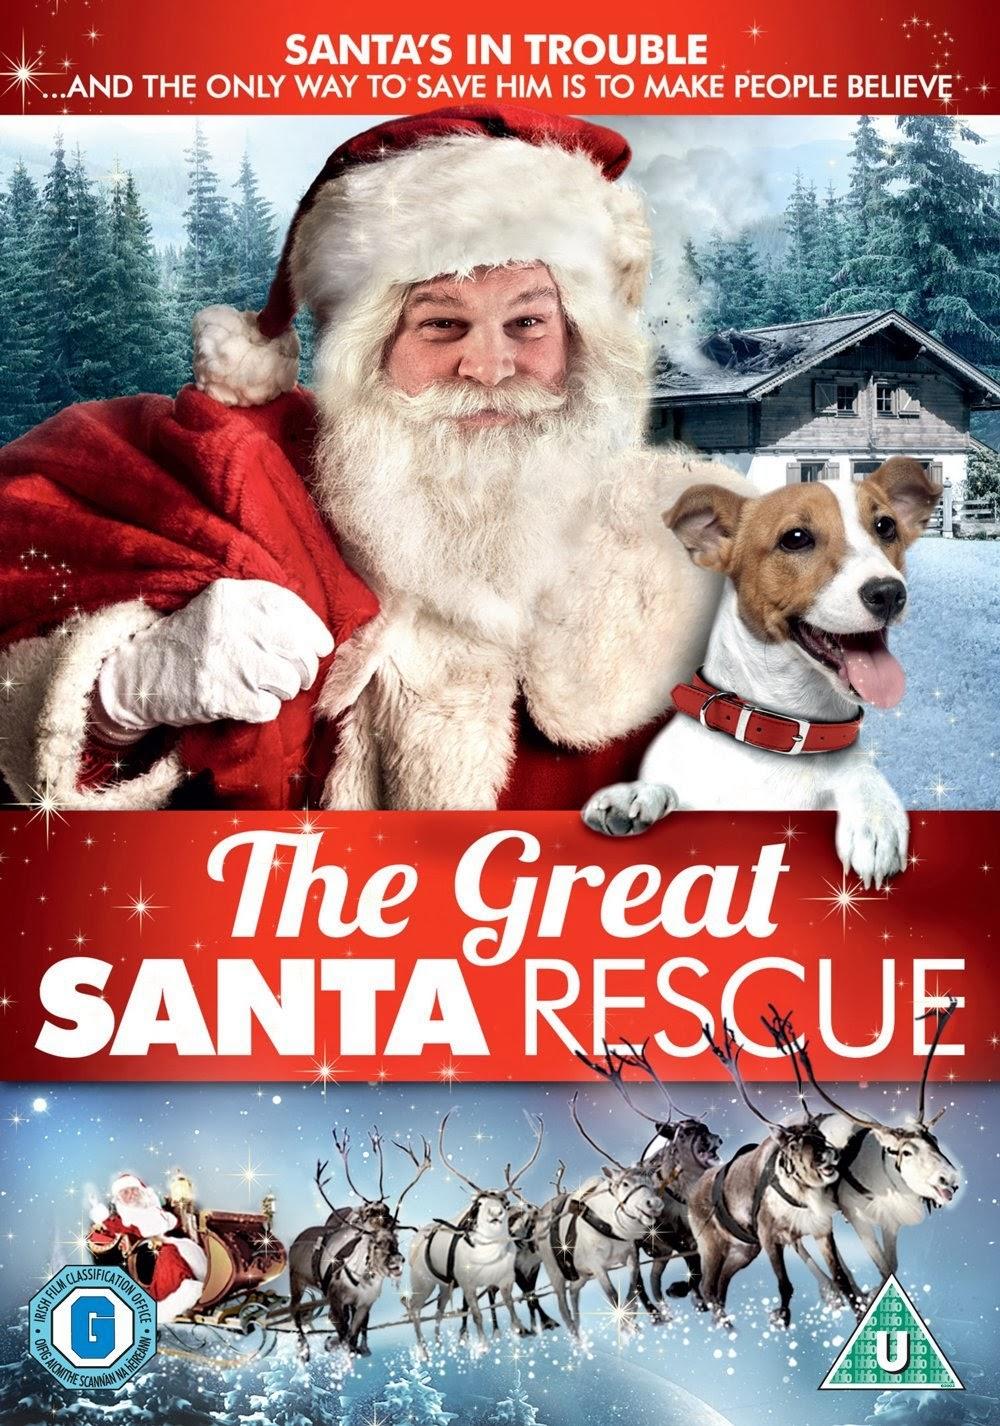 Curiosity Of A Social Misfit: The Great Santa Rescue Pre-Release DVD ...